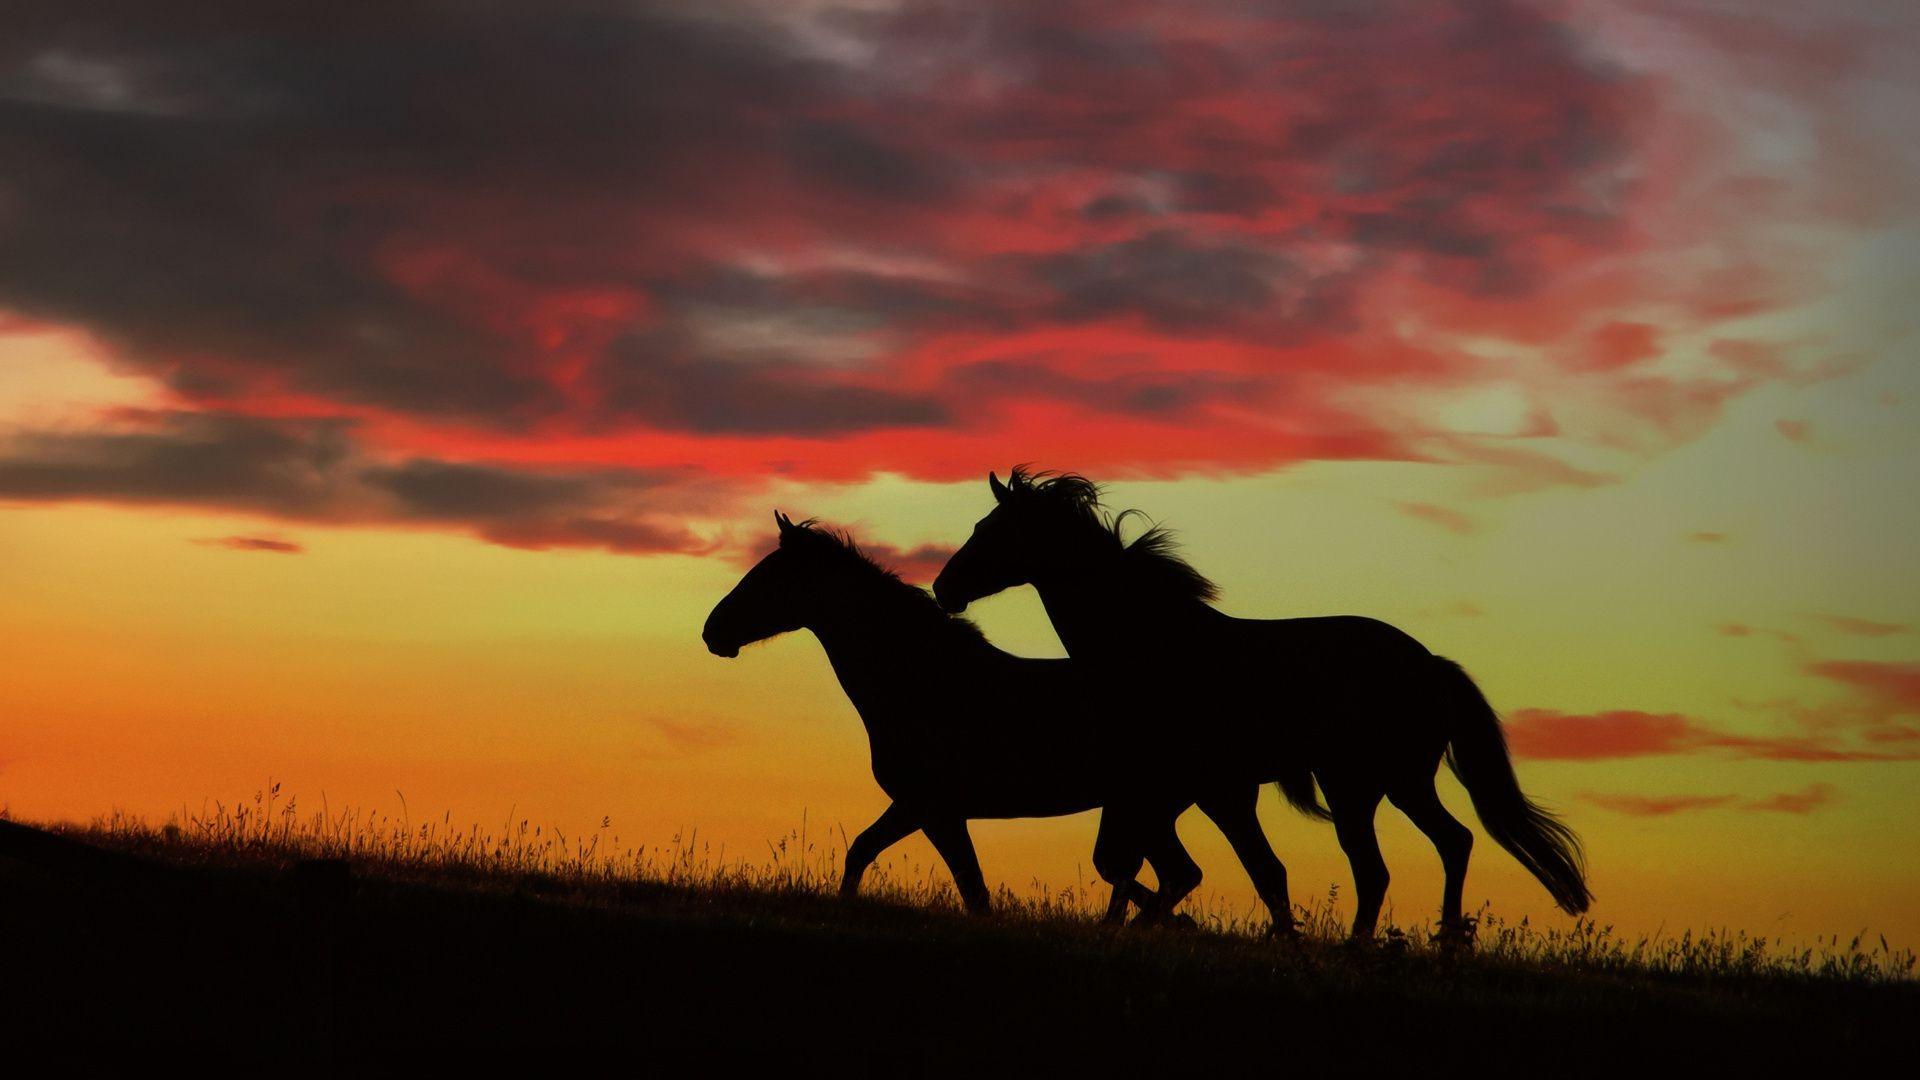 Картинки мустангов лошадей на dom-cvety.com | 1080x1920